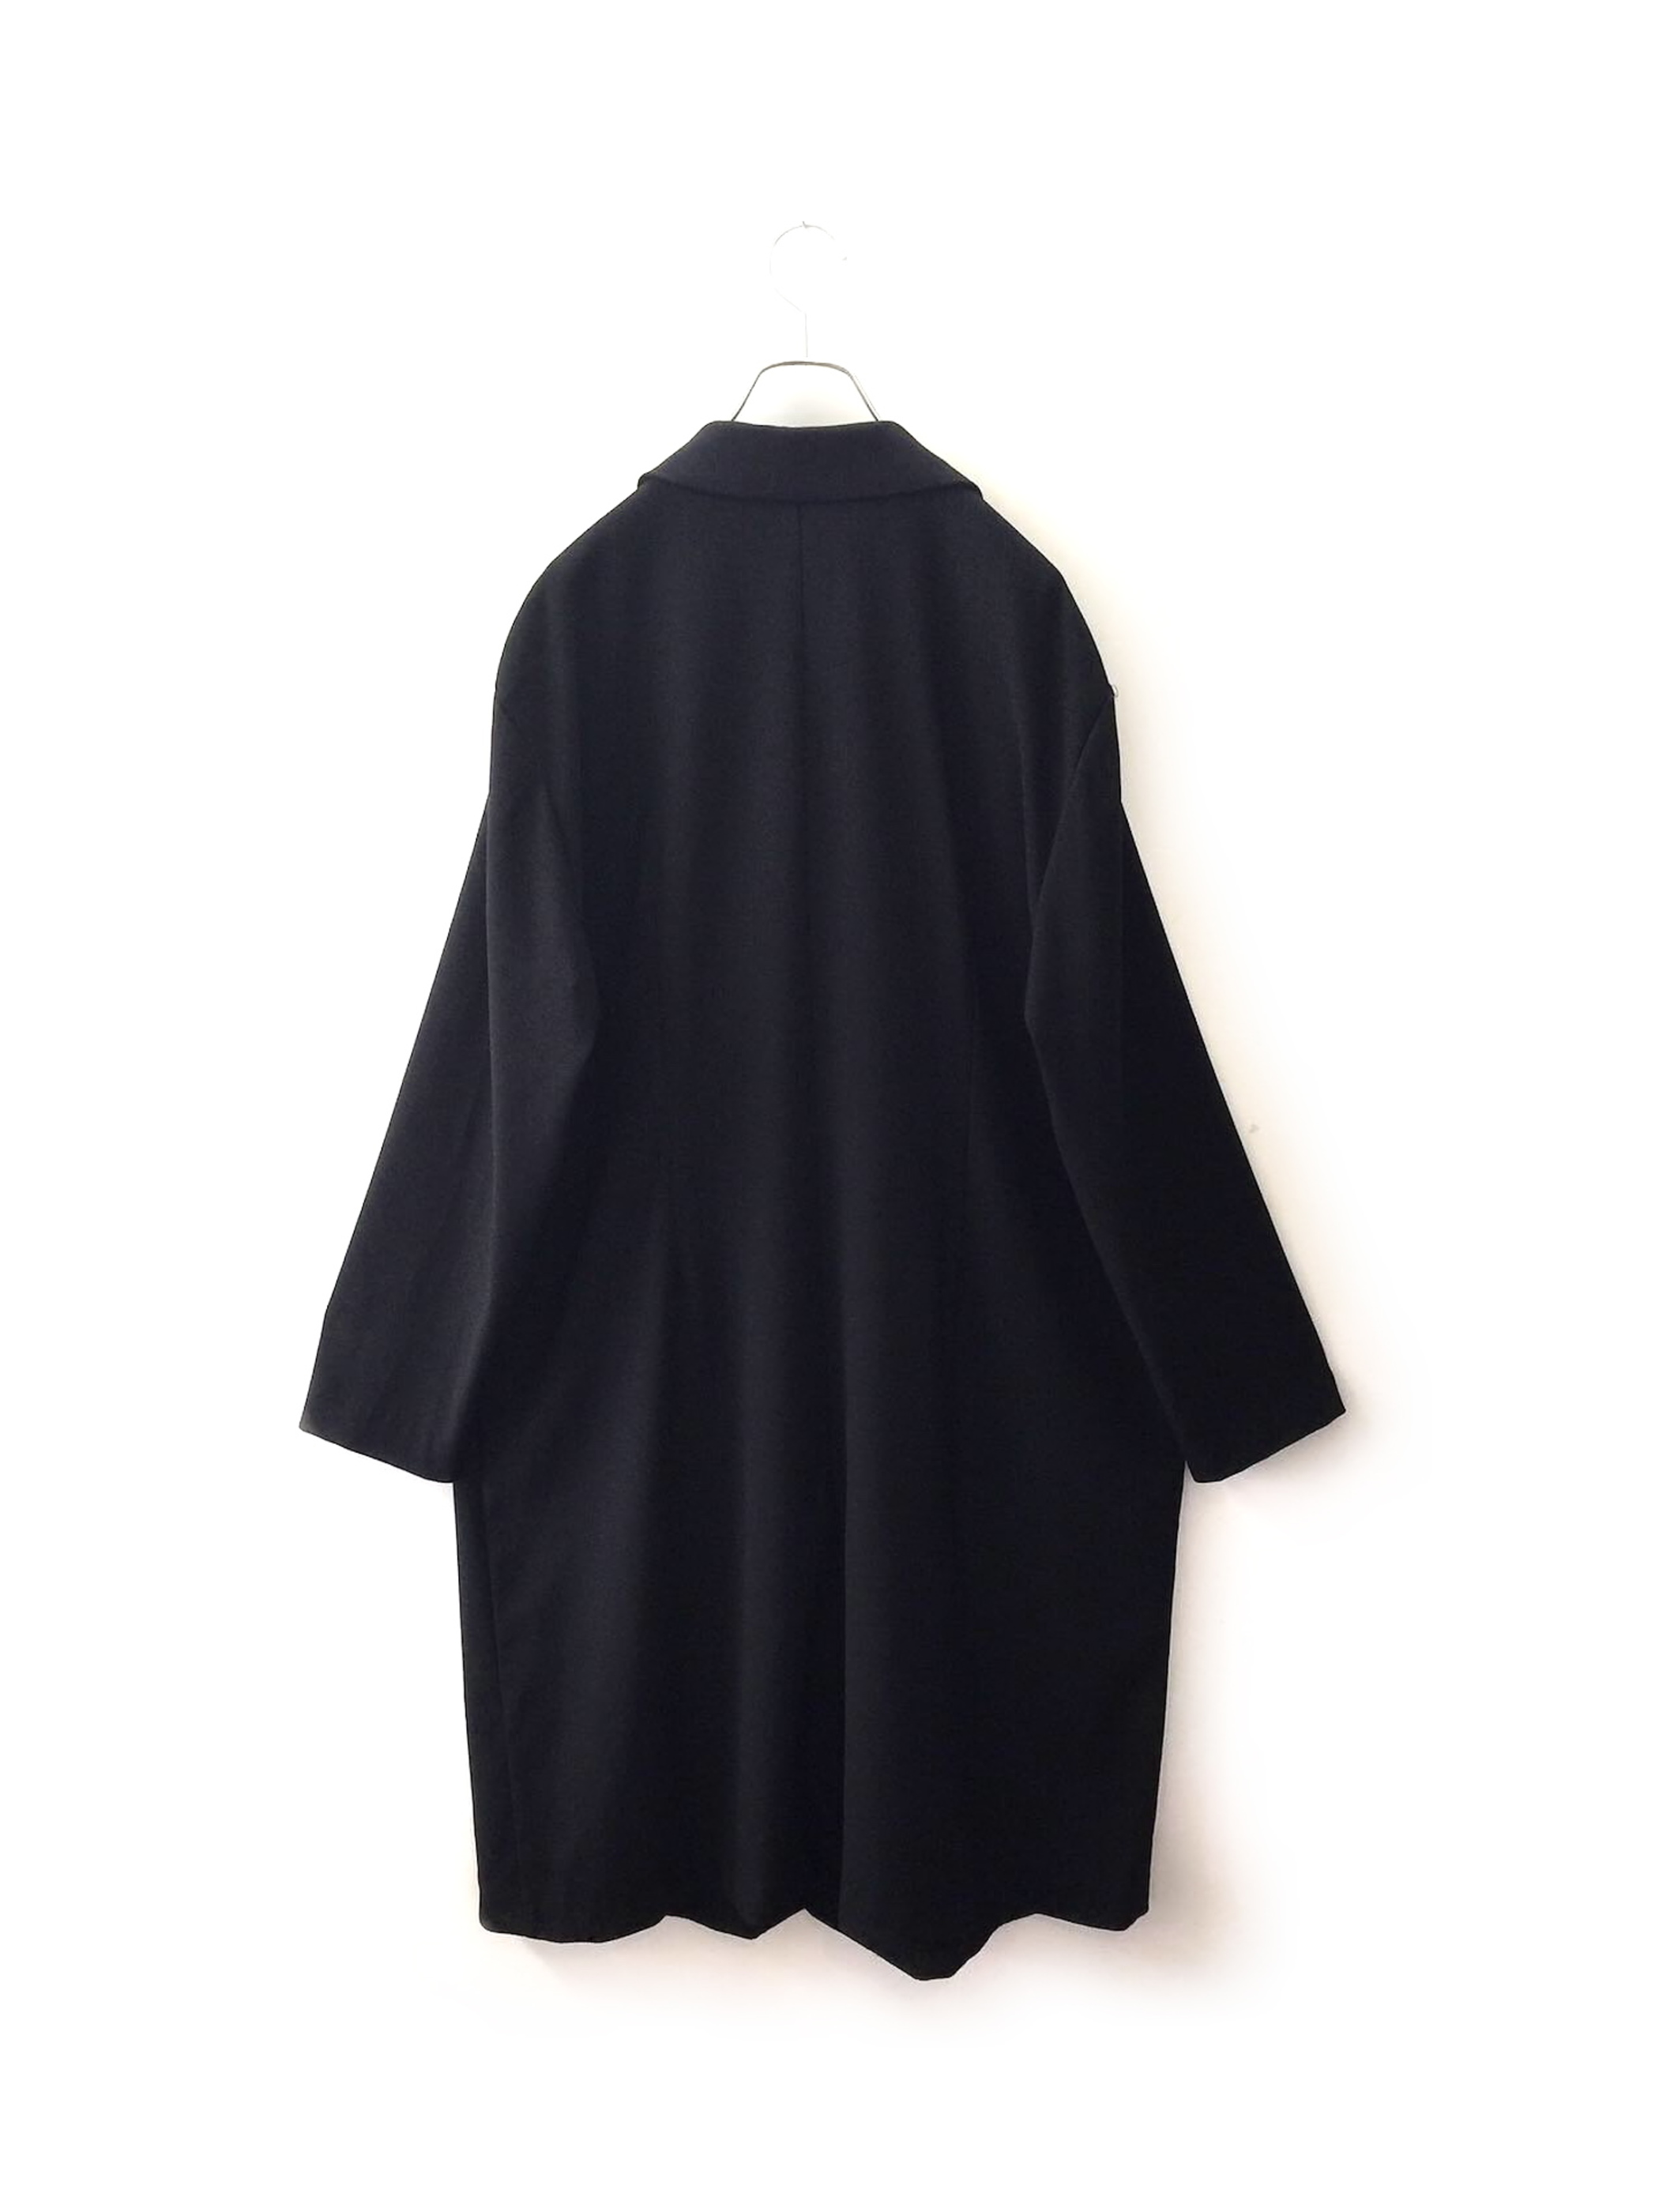 DANI MAX 薄手 ロングコート 羽織り オーバーサイズ ブラック 古着